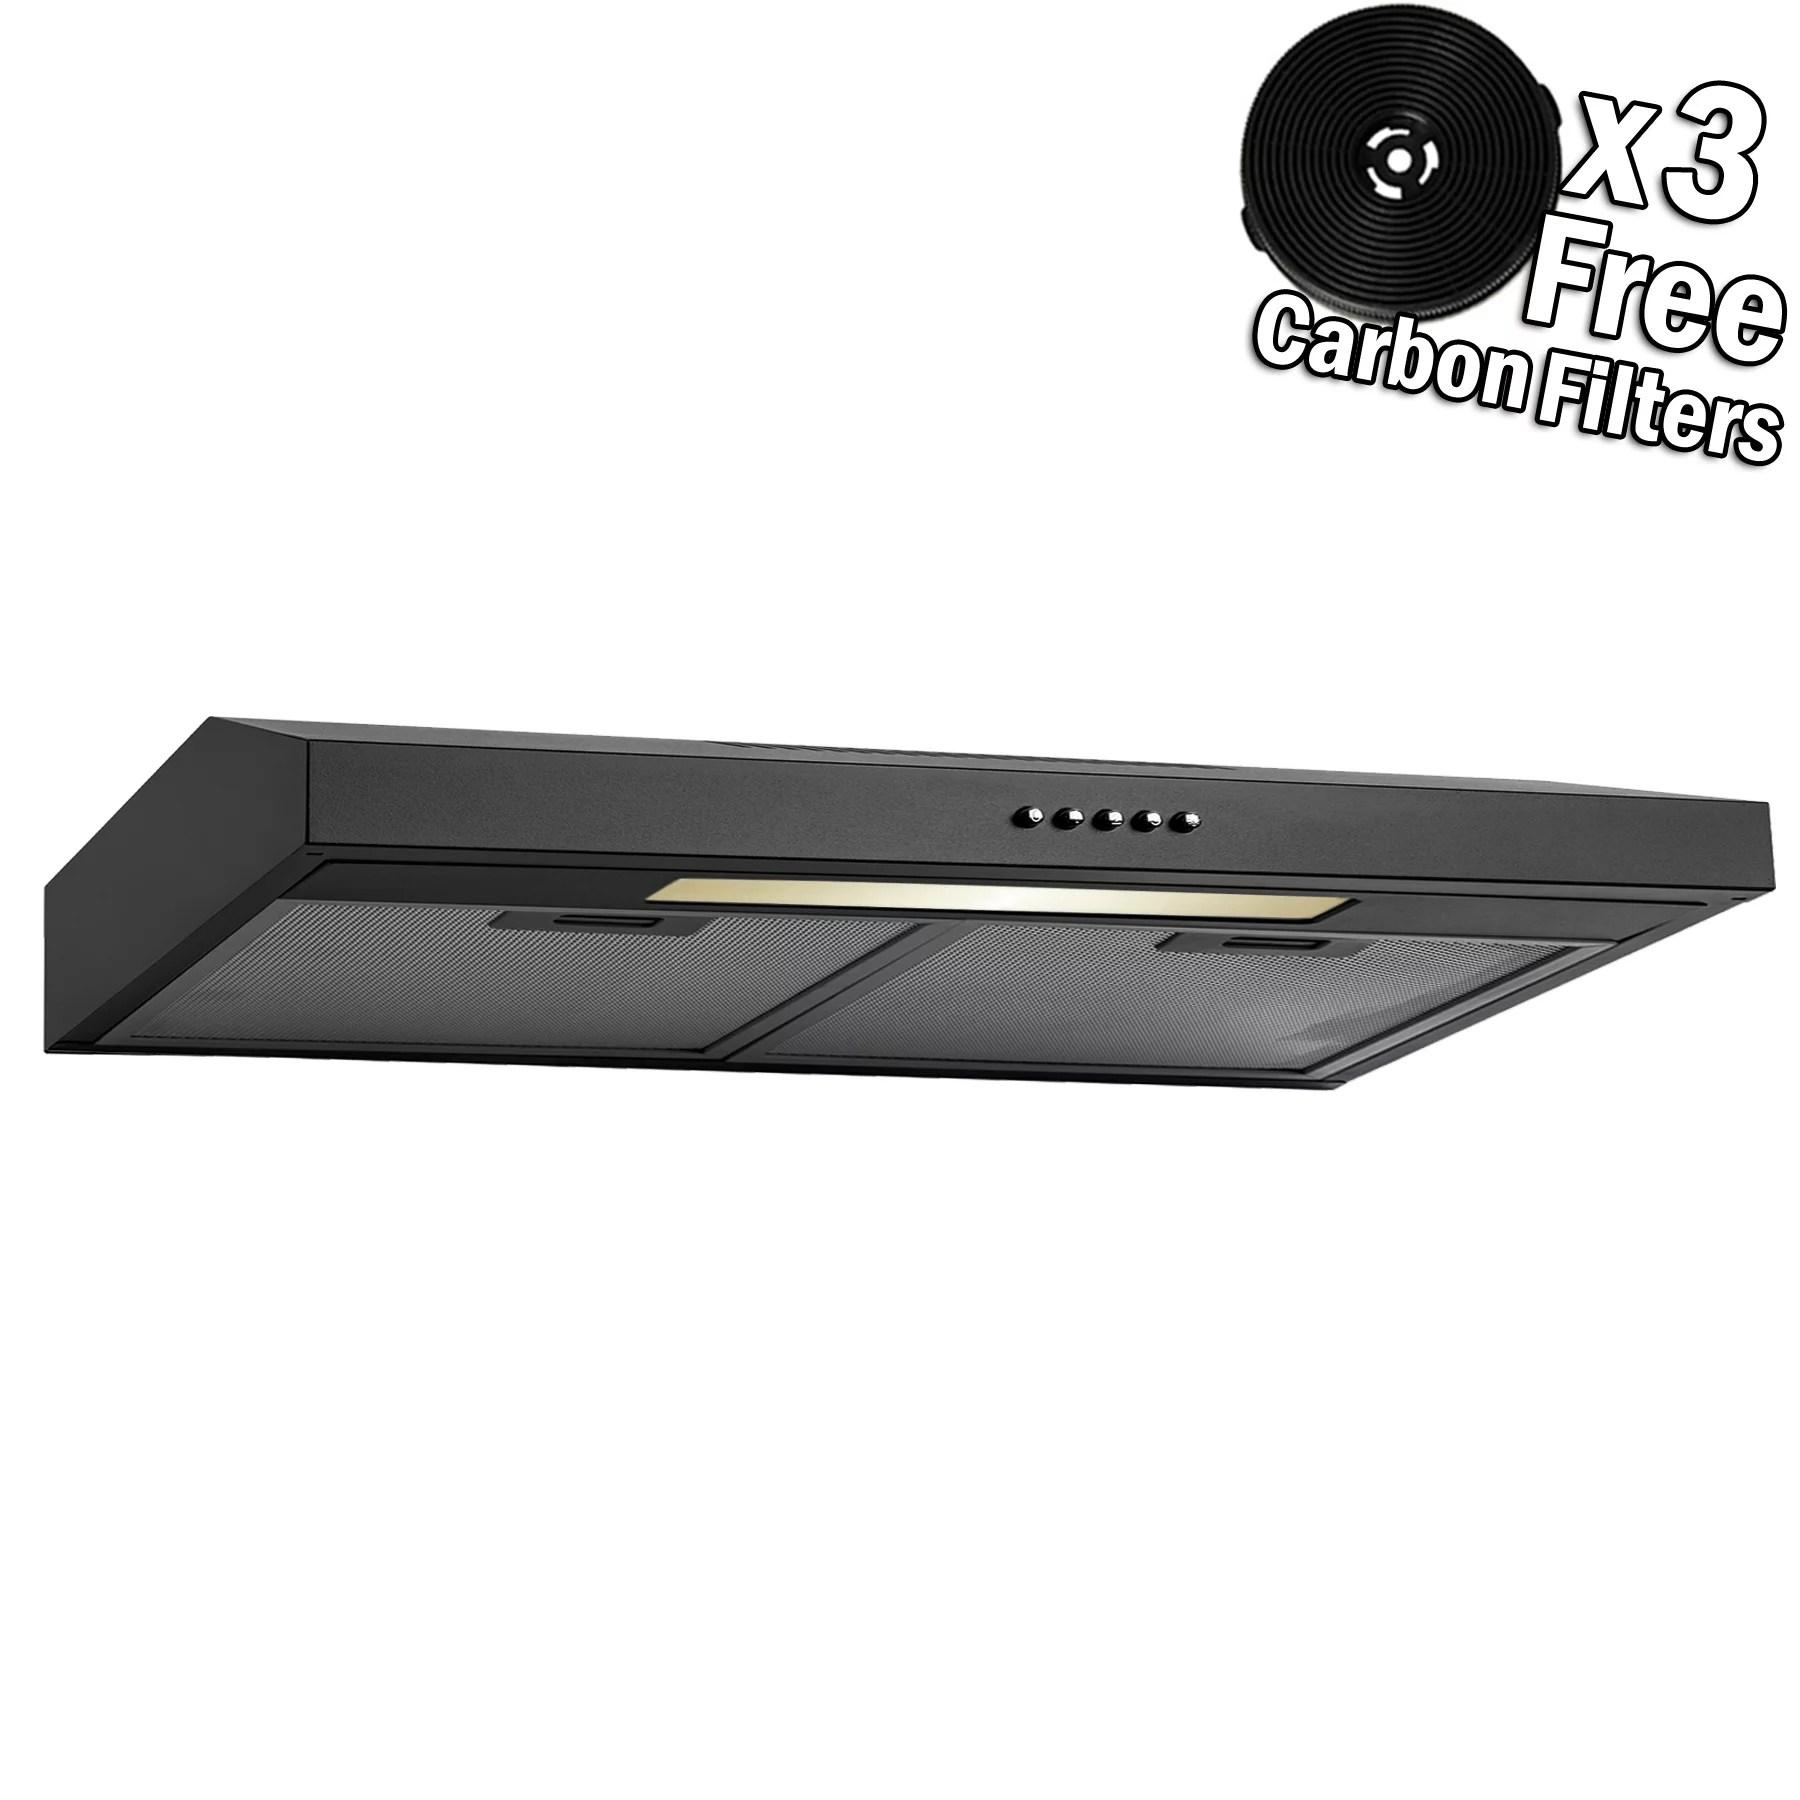 akdy rh0334 30 under cabinet black stainless steel range hood